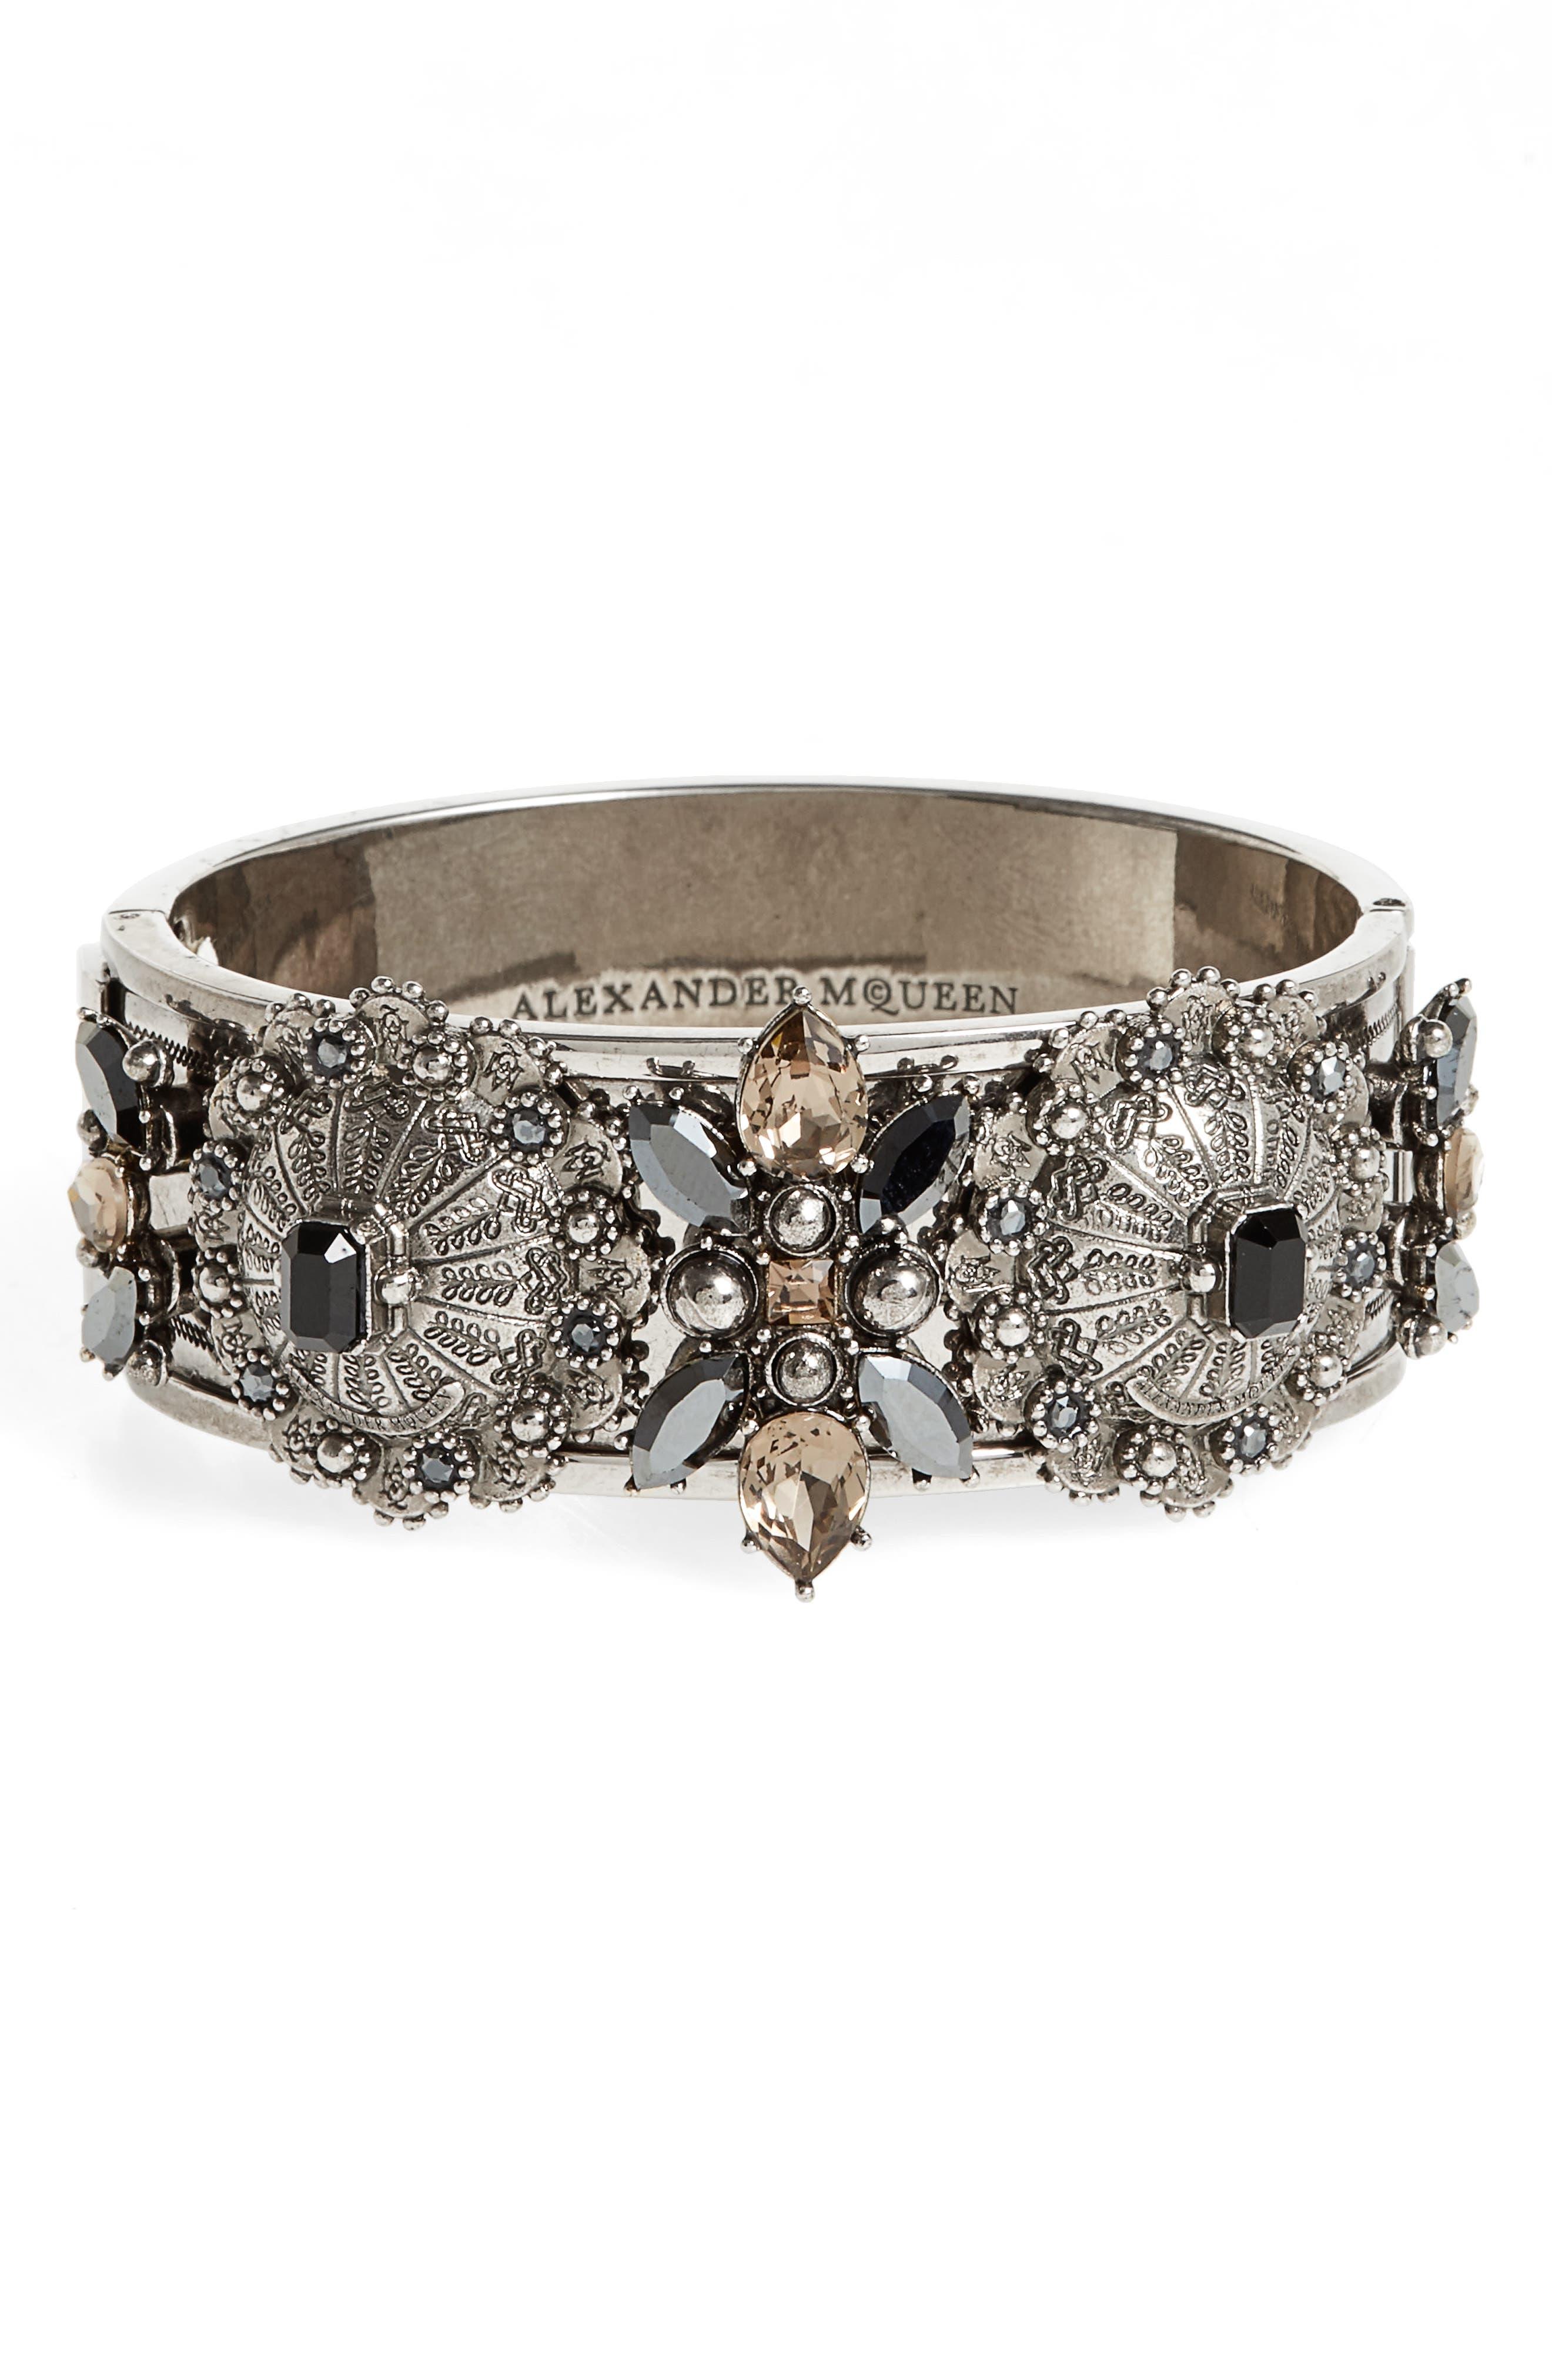 Main Image - Alexander McQueen Jeweled Hinge Cuff